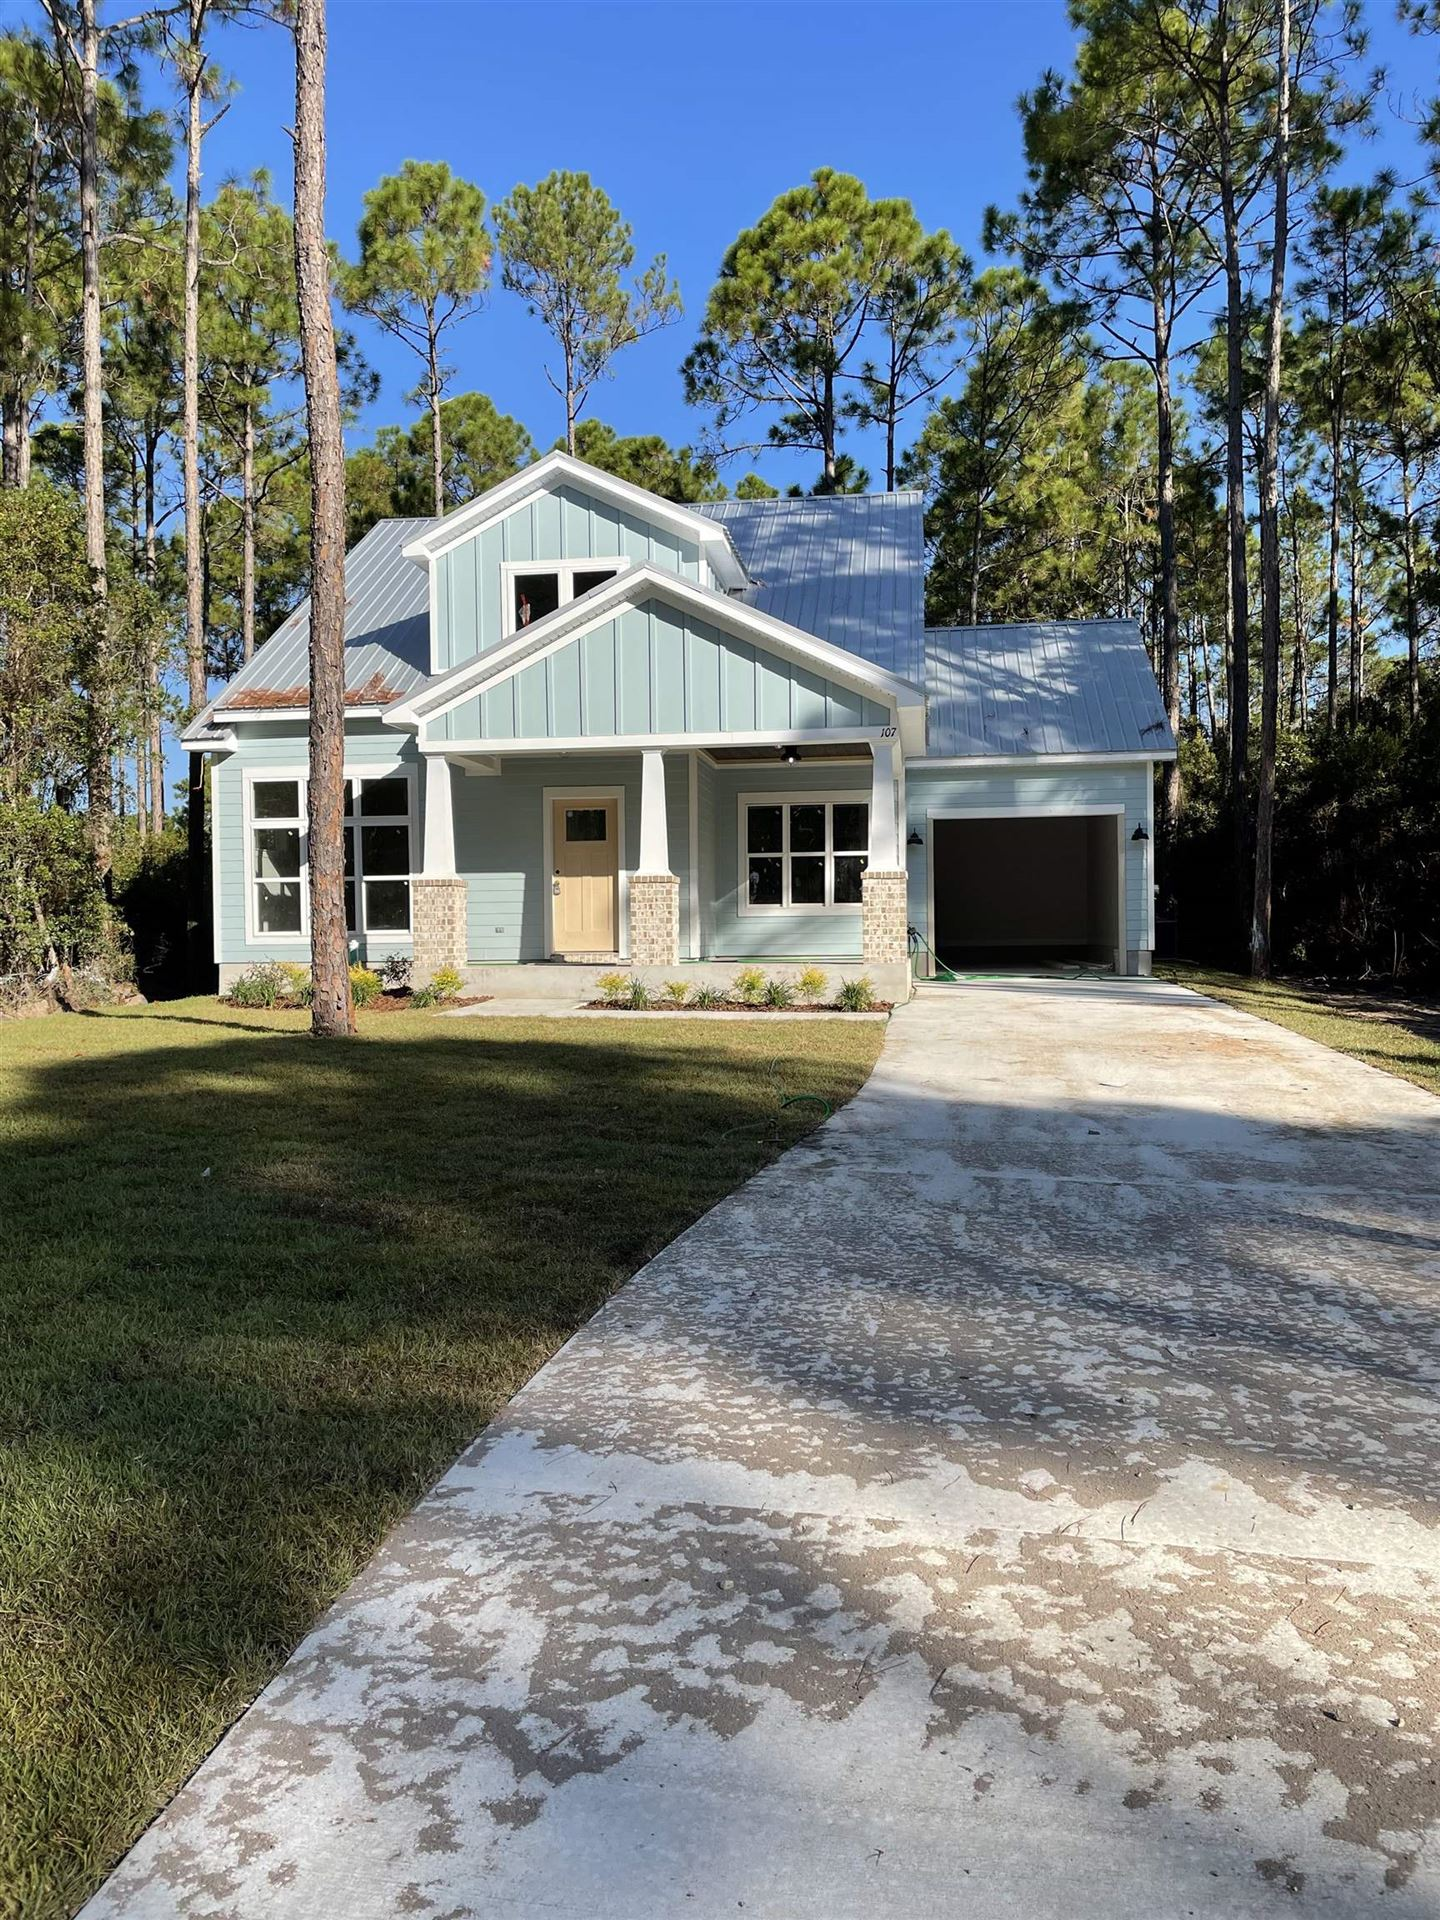 107 Royal Tern Way, Carabelle, FL 32323 - MLS#: 333195